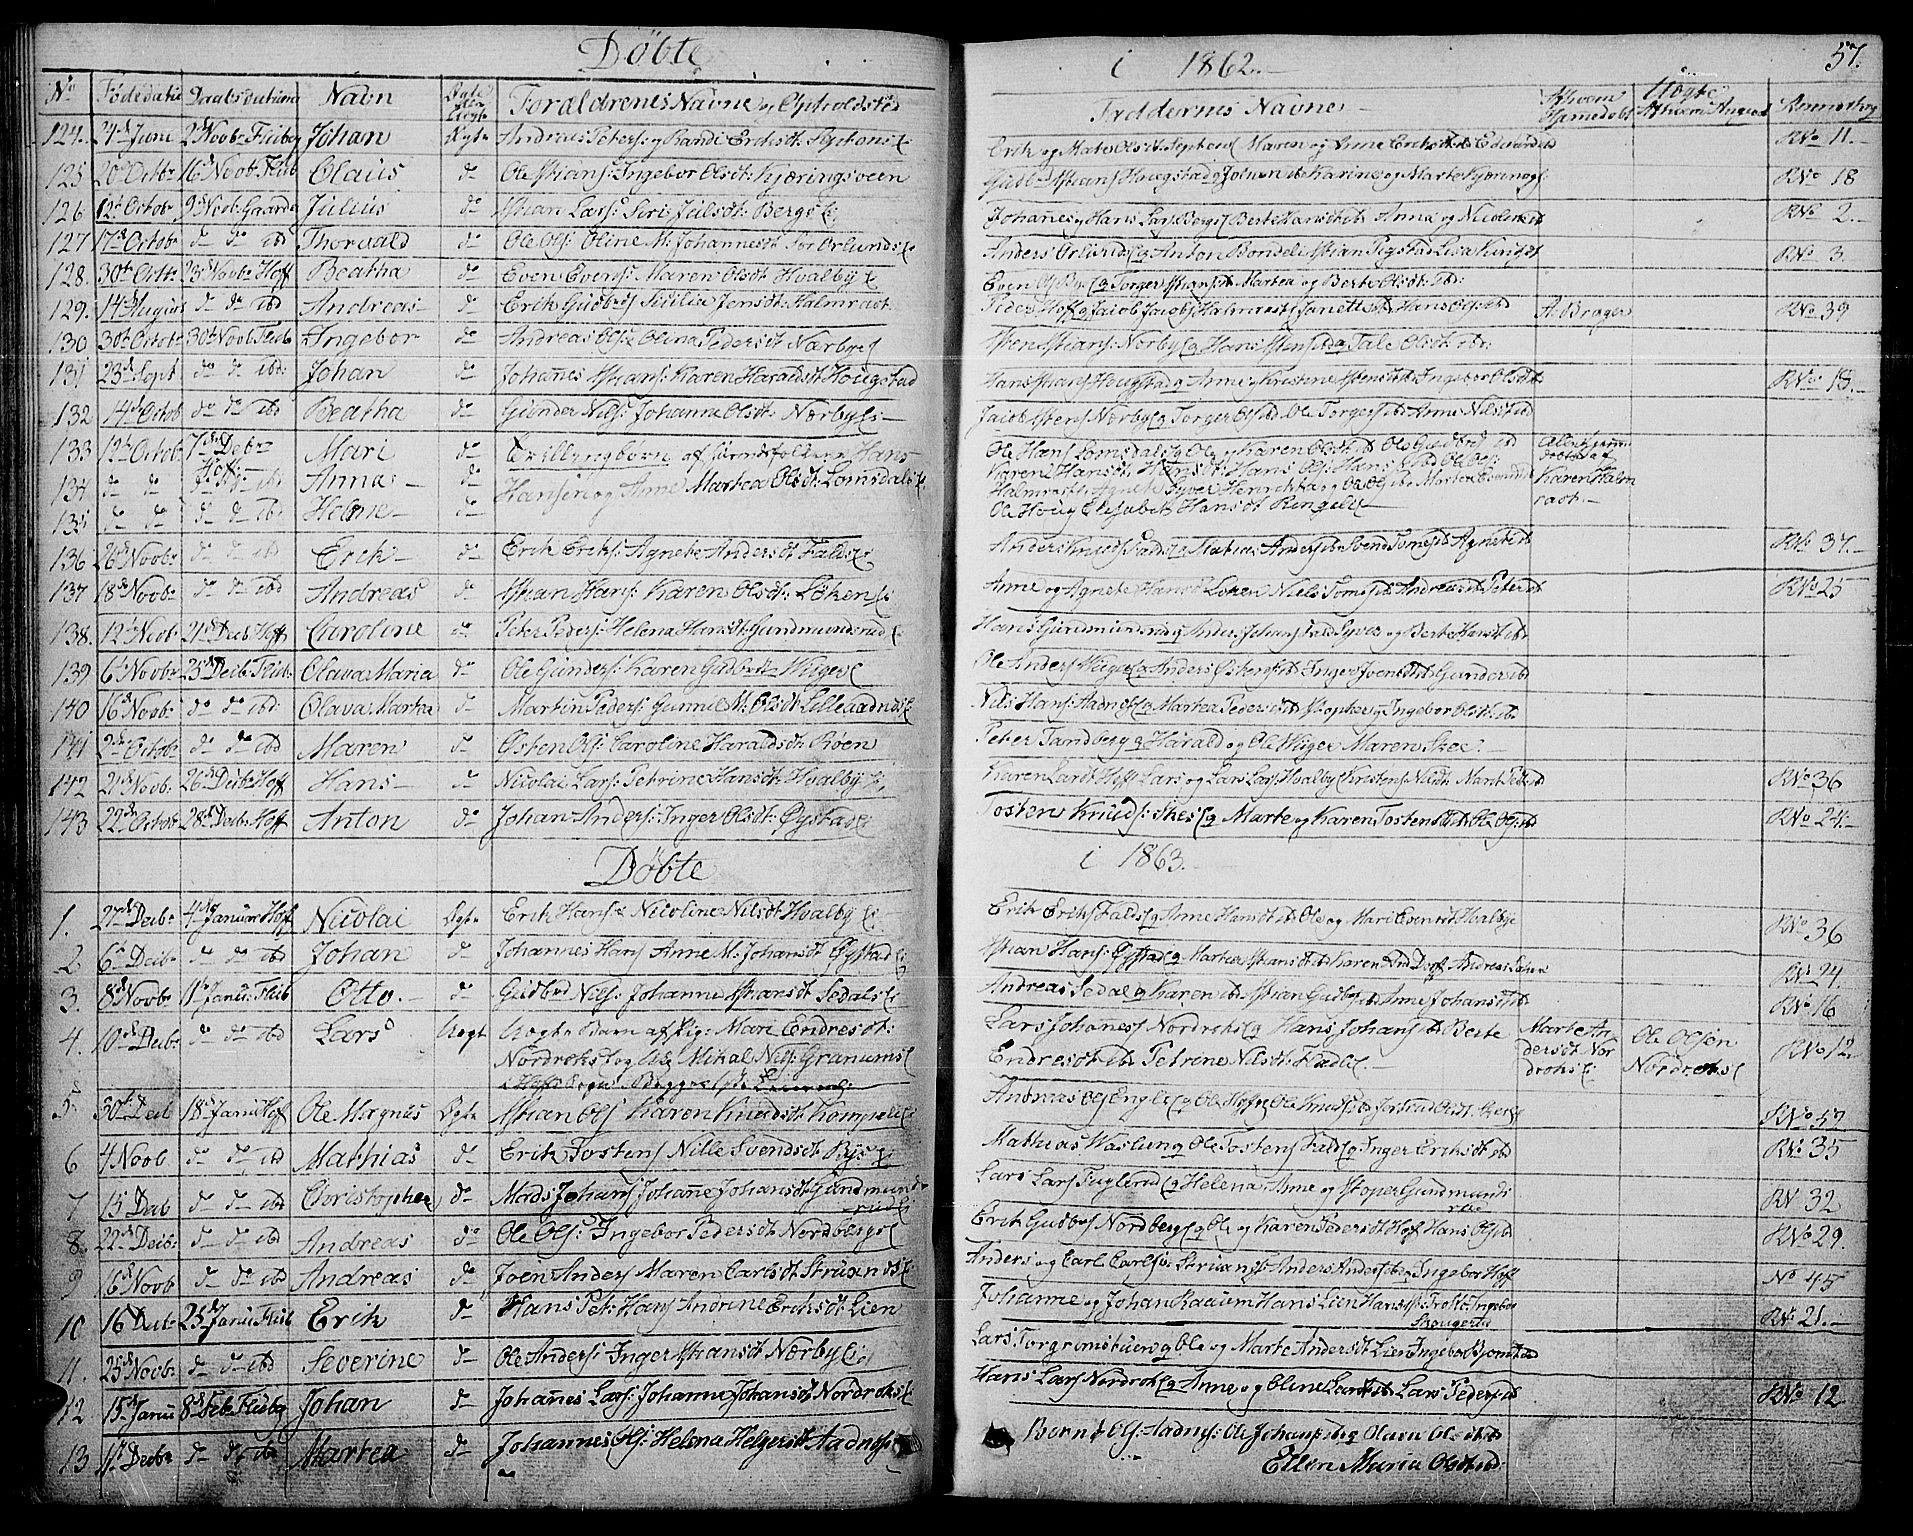 SAH, Søndre Land prestekontor, L/L0001: Klokkerbok nr. 1, 1849-1883, s. 57